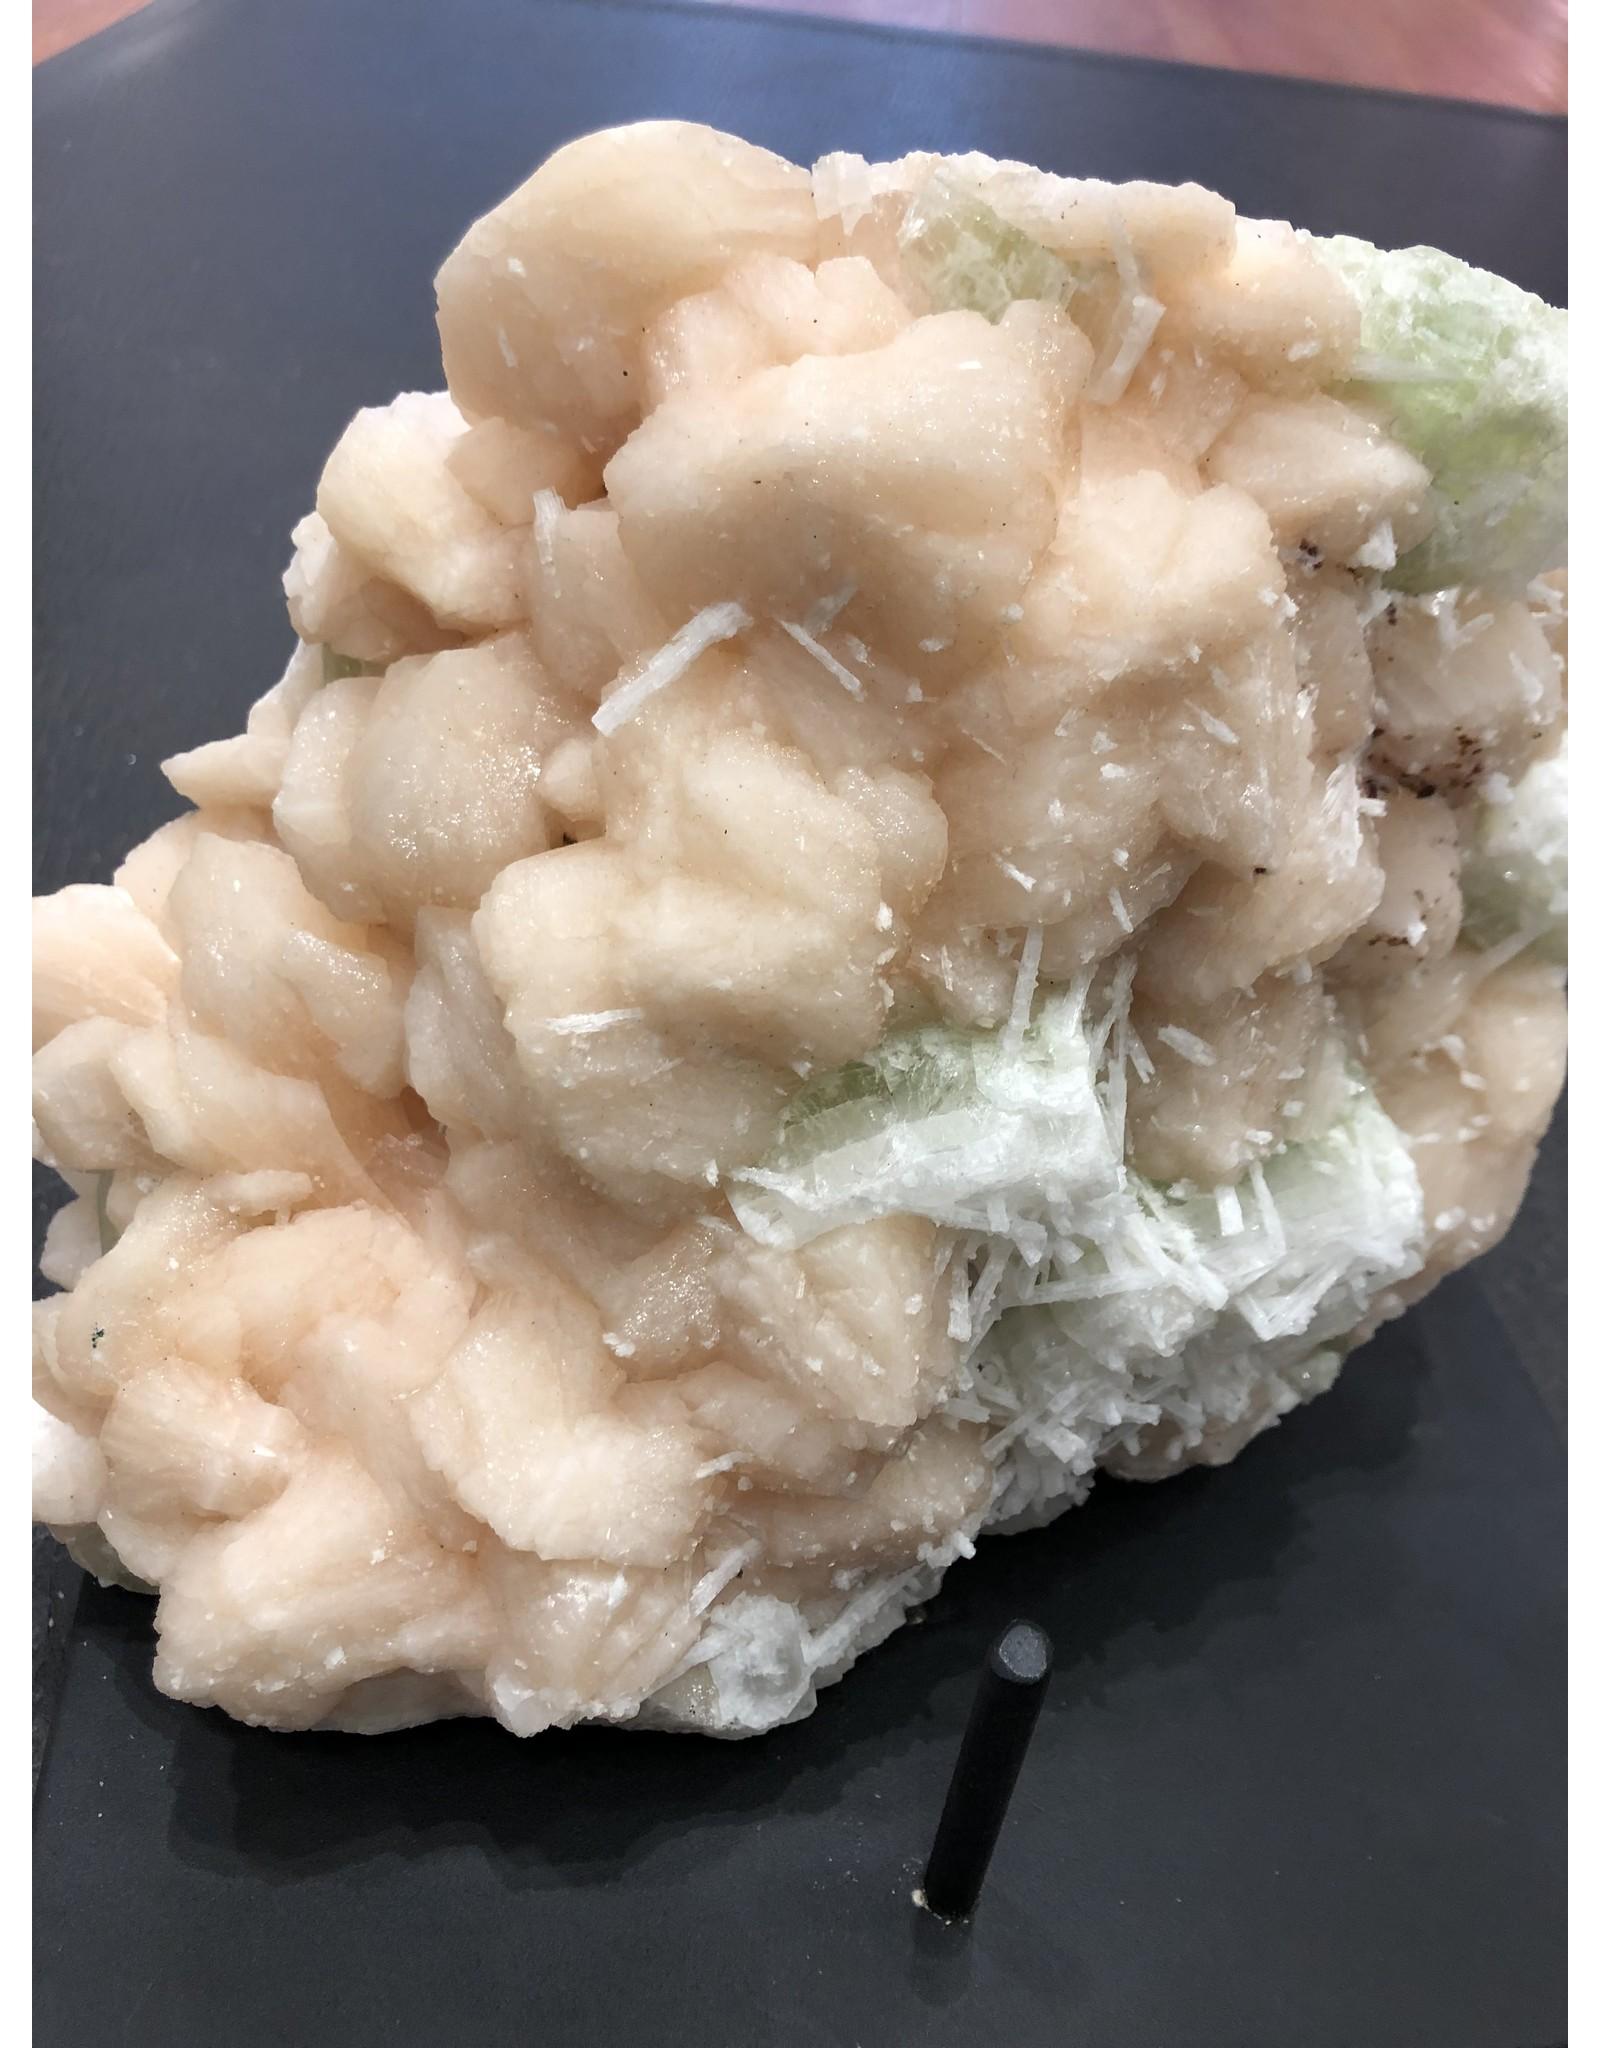 Scolecite Crystals on Stillbite & Apophylite